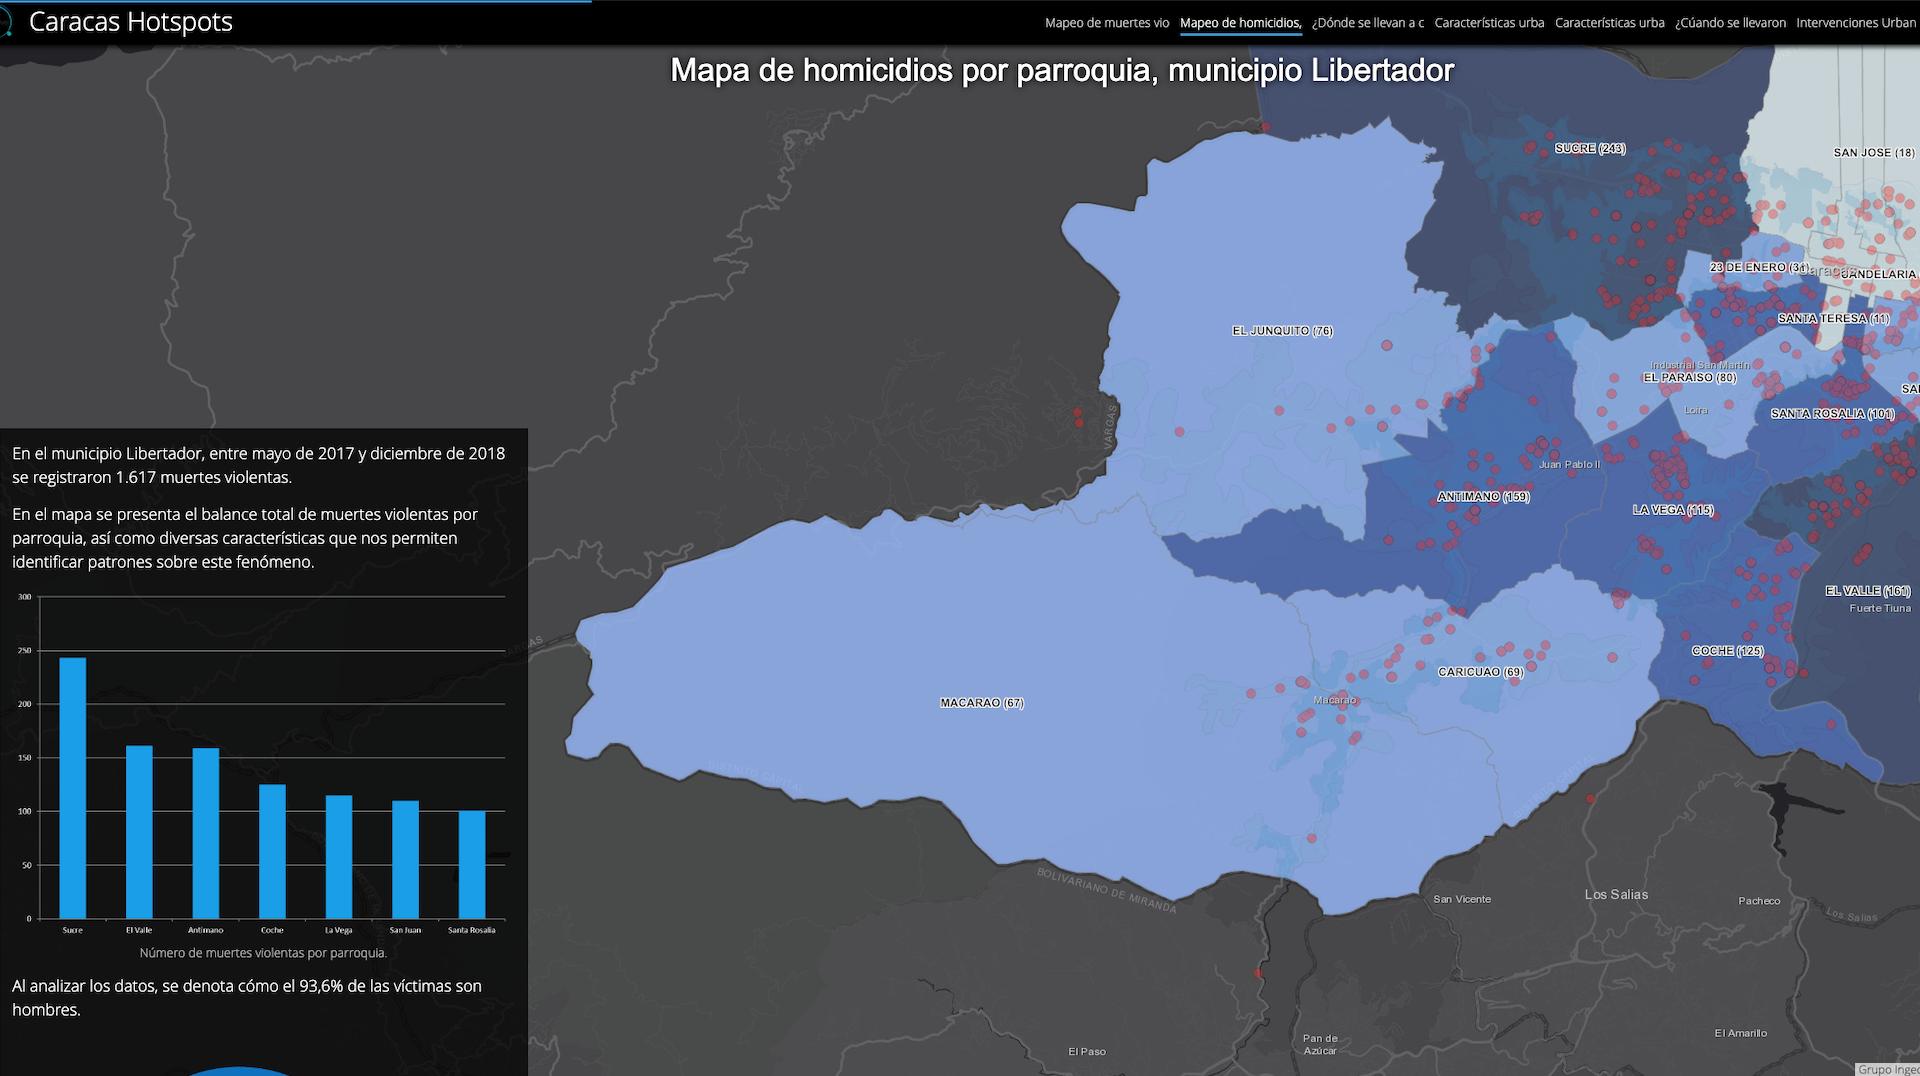 #MonitorDeVíctimas | Caracas Hotspots